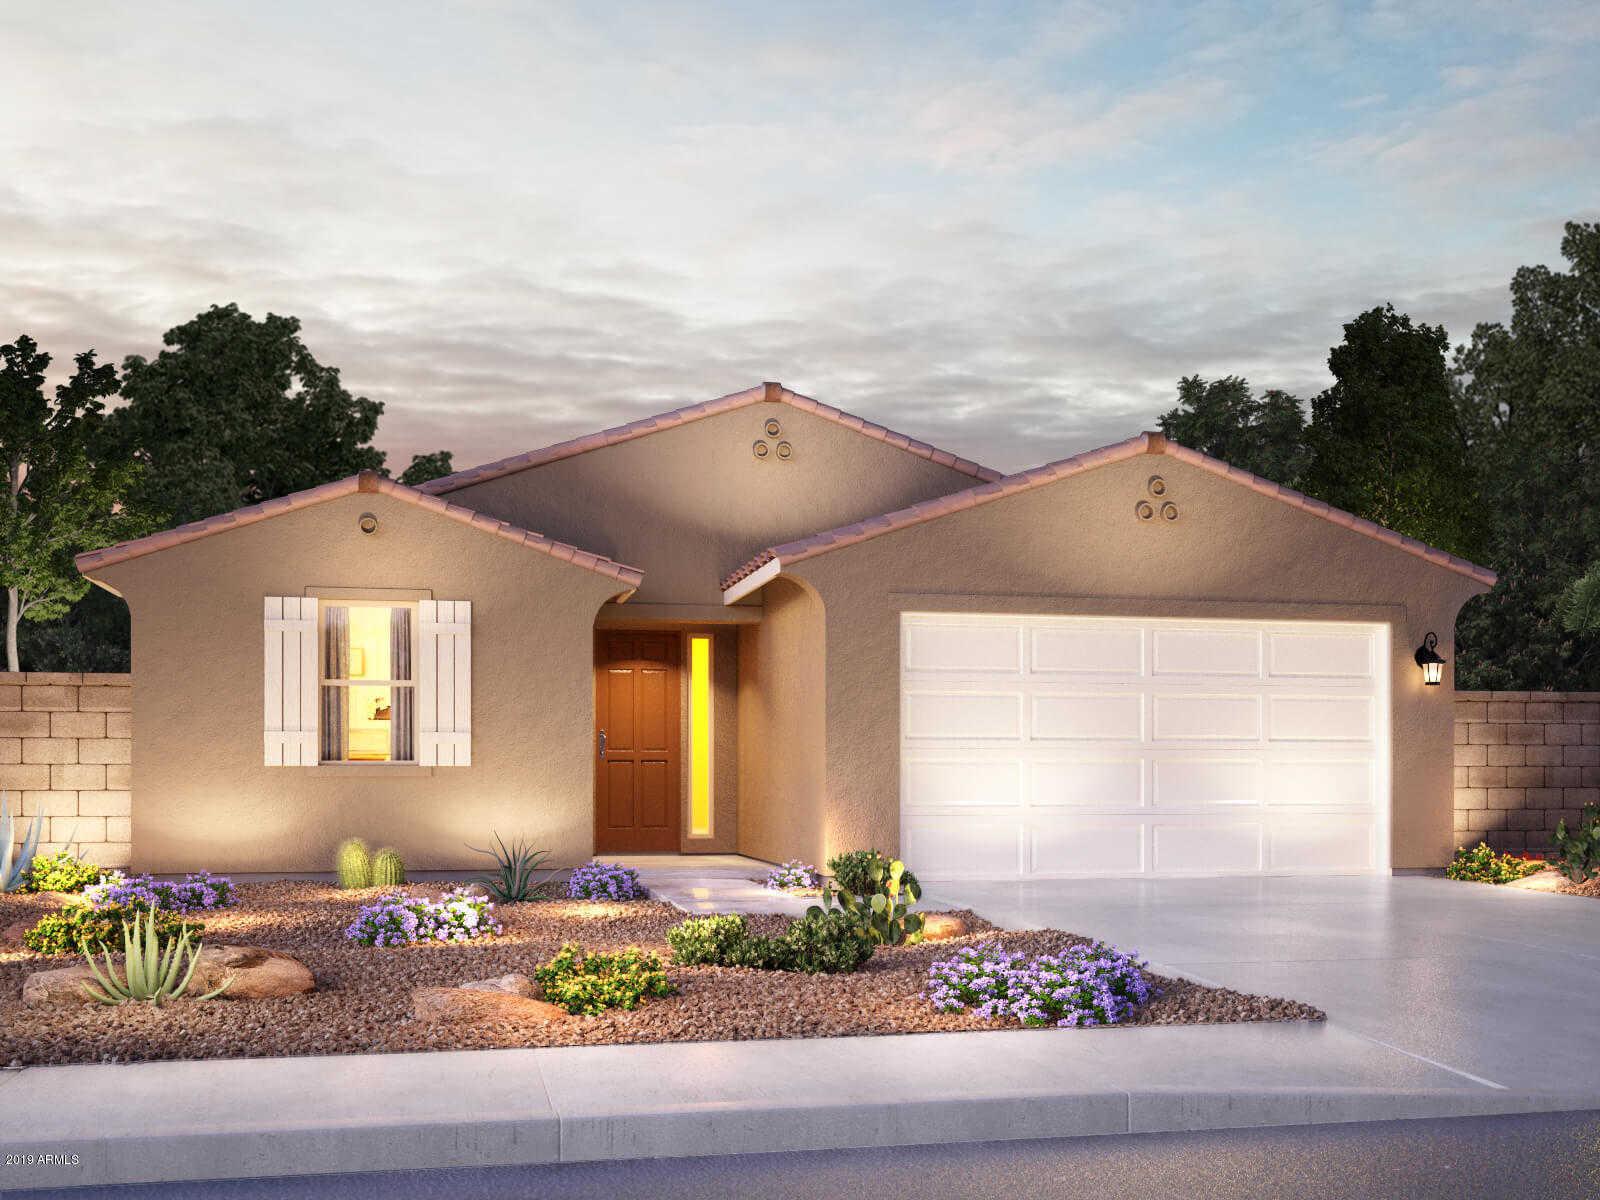 $310,495 - 4Br/3Ba - Home for Sale in Marbella Ranch Parcel 1, Glendale